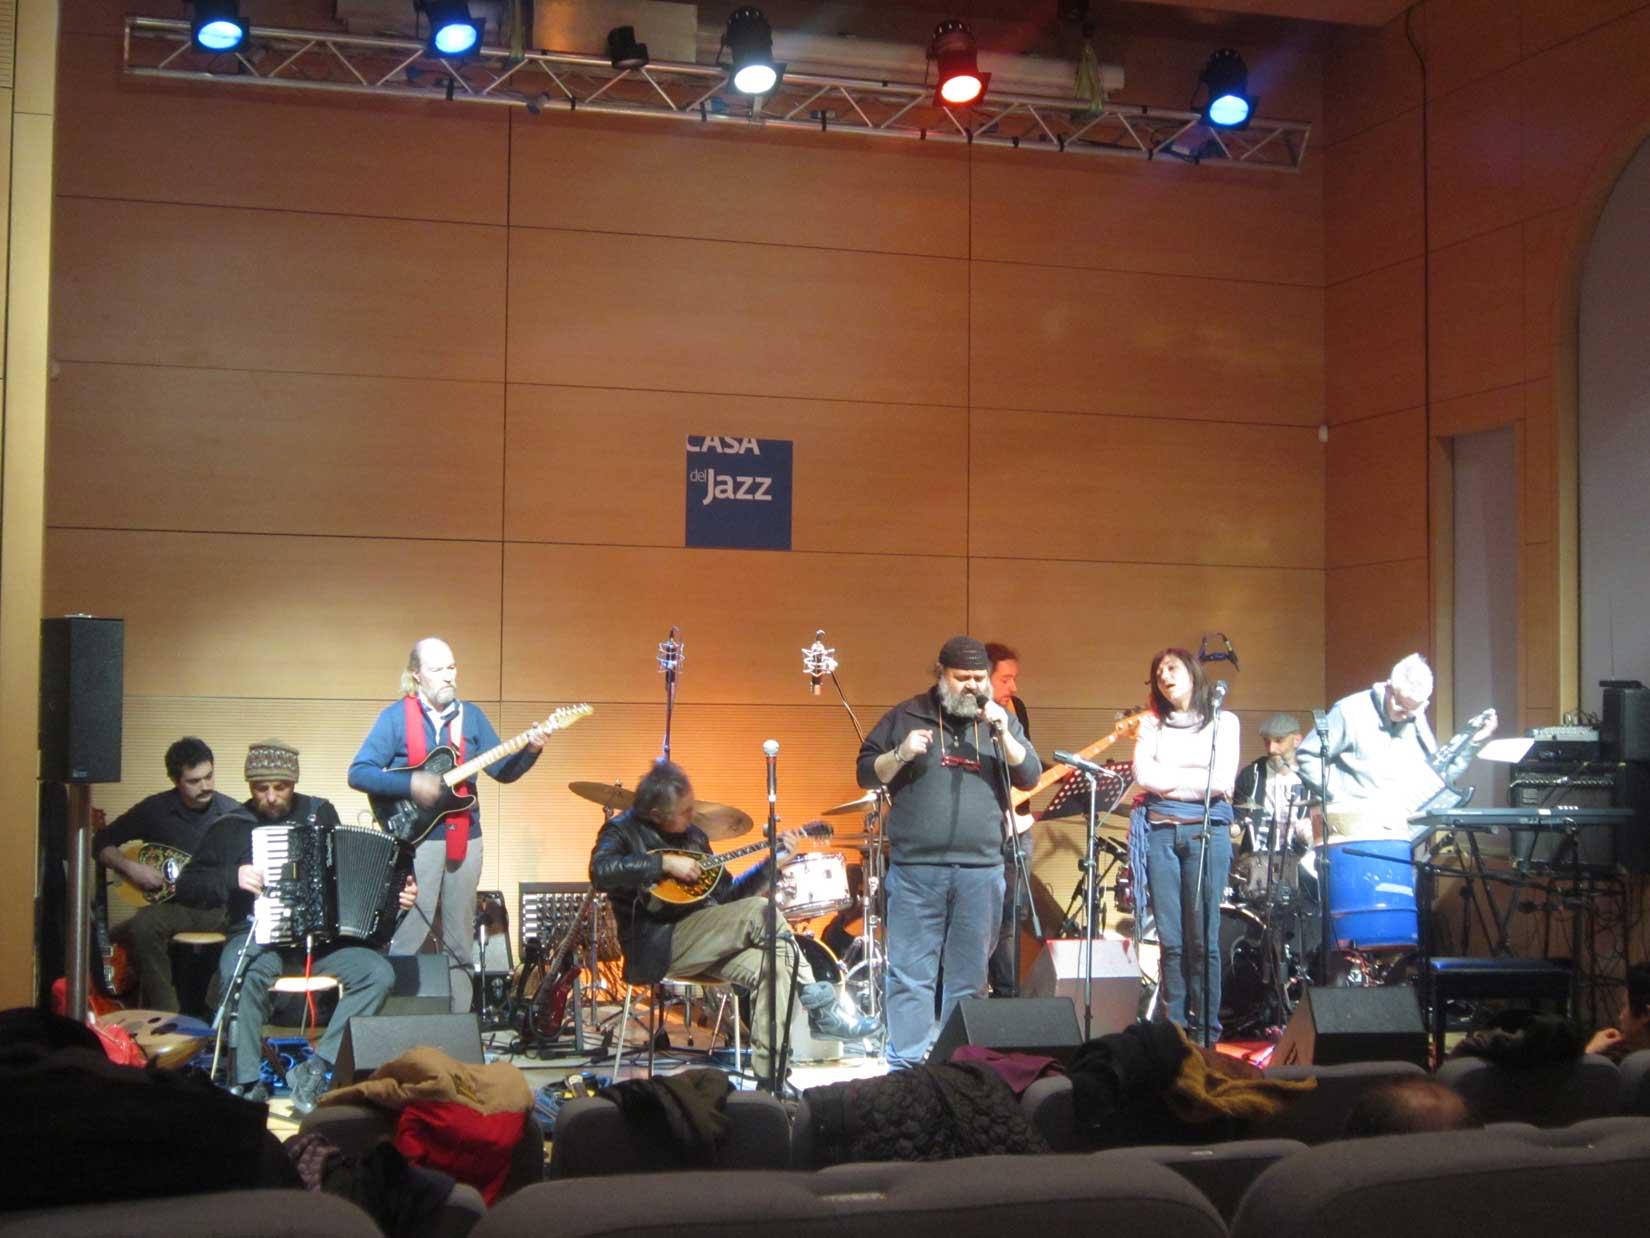 Indaco - Mario Pio Mancini Rodolfo Maltese And The New Ensemble Indaco